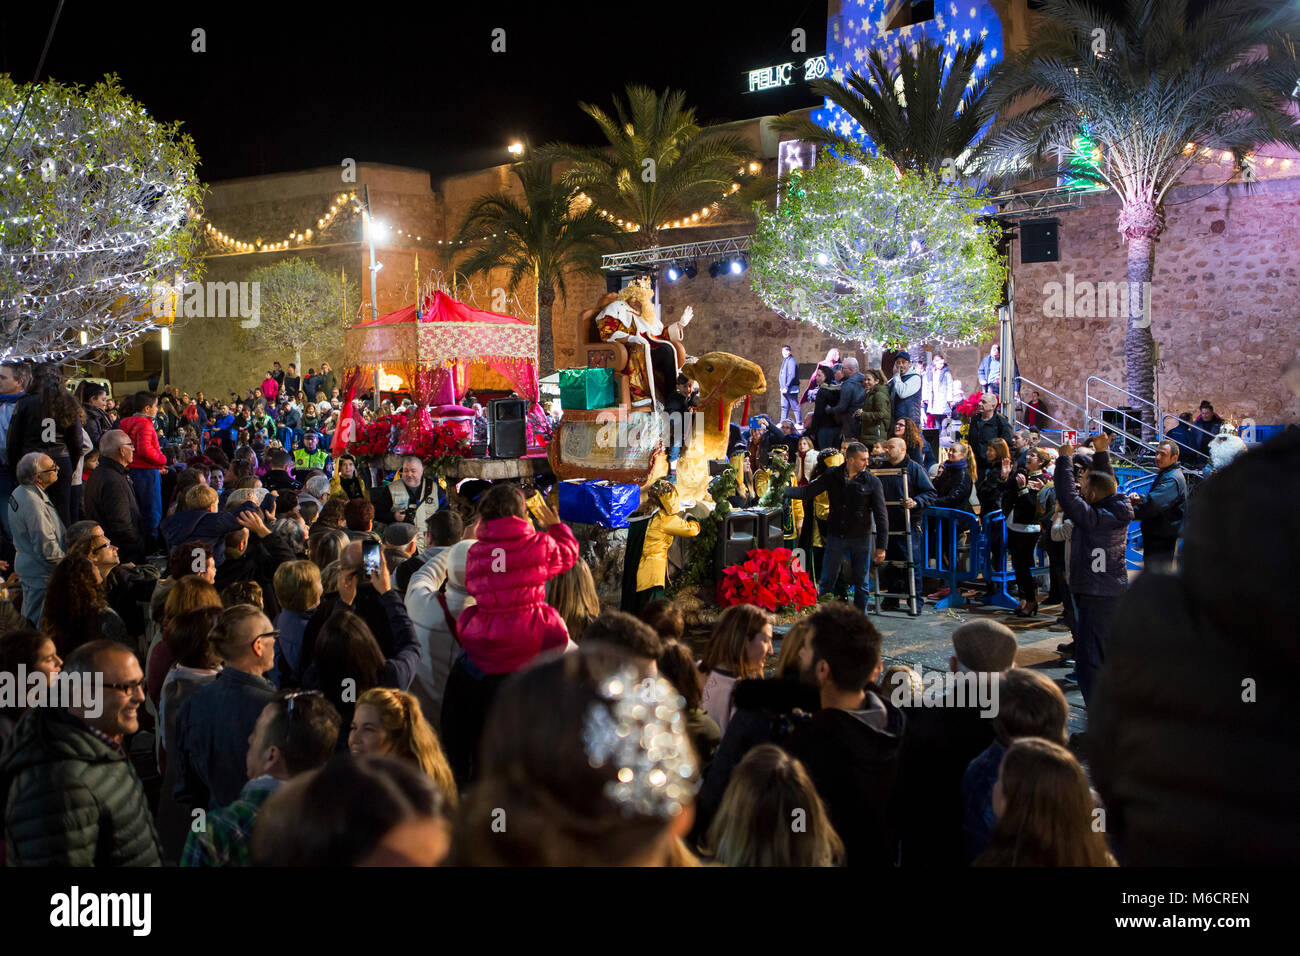 Santa Pola/Spain - Januari 5 2018: Christmas Parade 'Three Kings Parade' along the streets in the city with - Stock Image